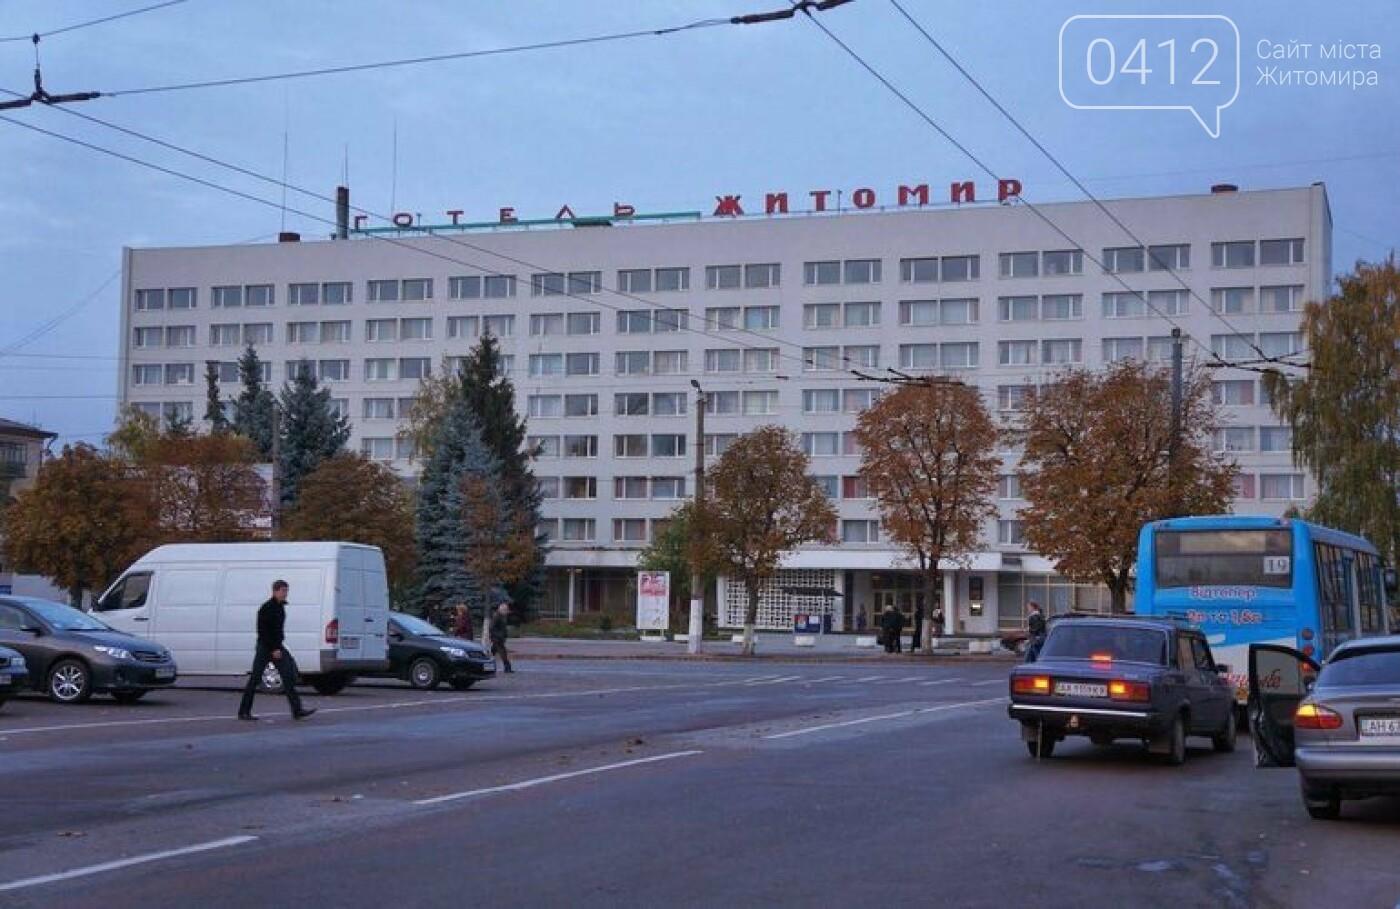 "Готель ""Житомир"" планують приватизувати, фото-1"